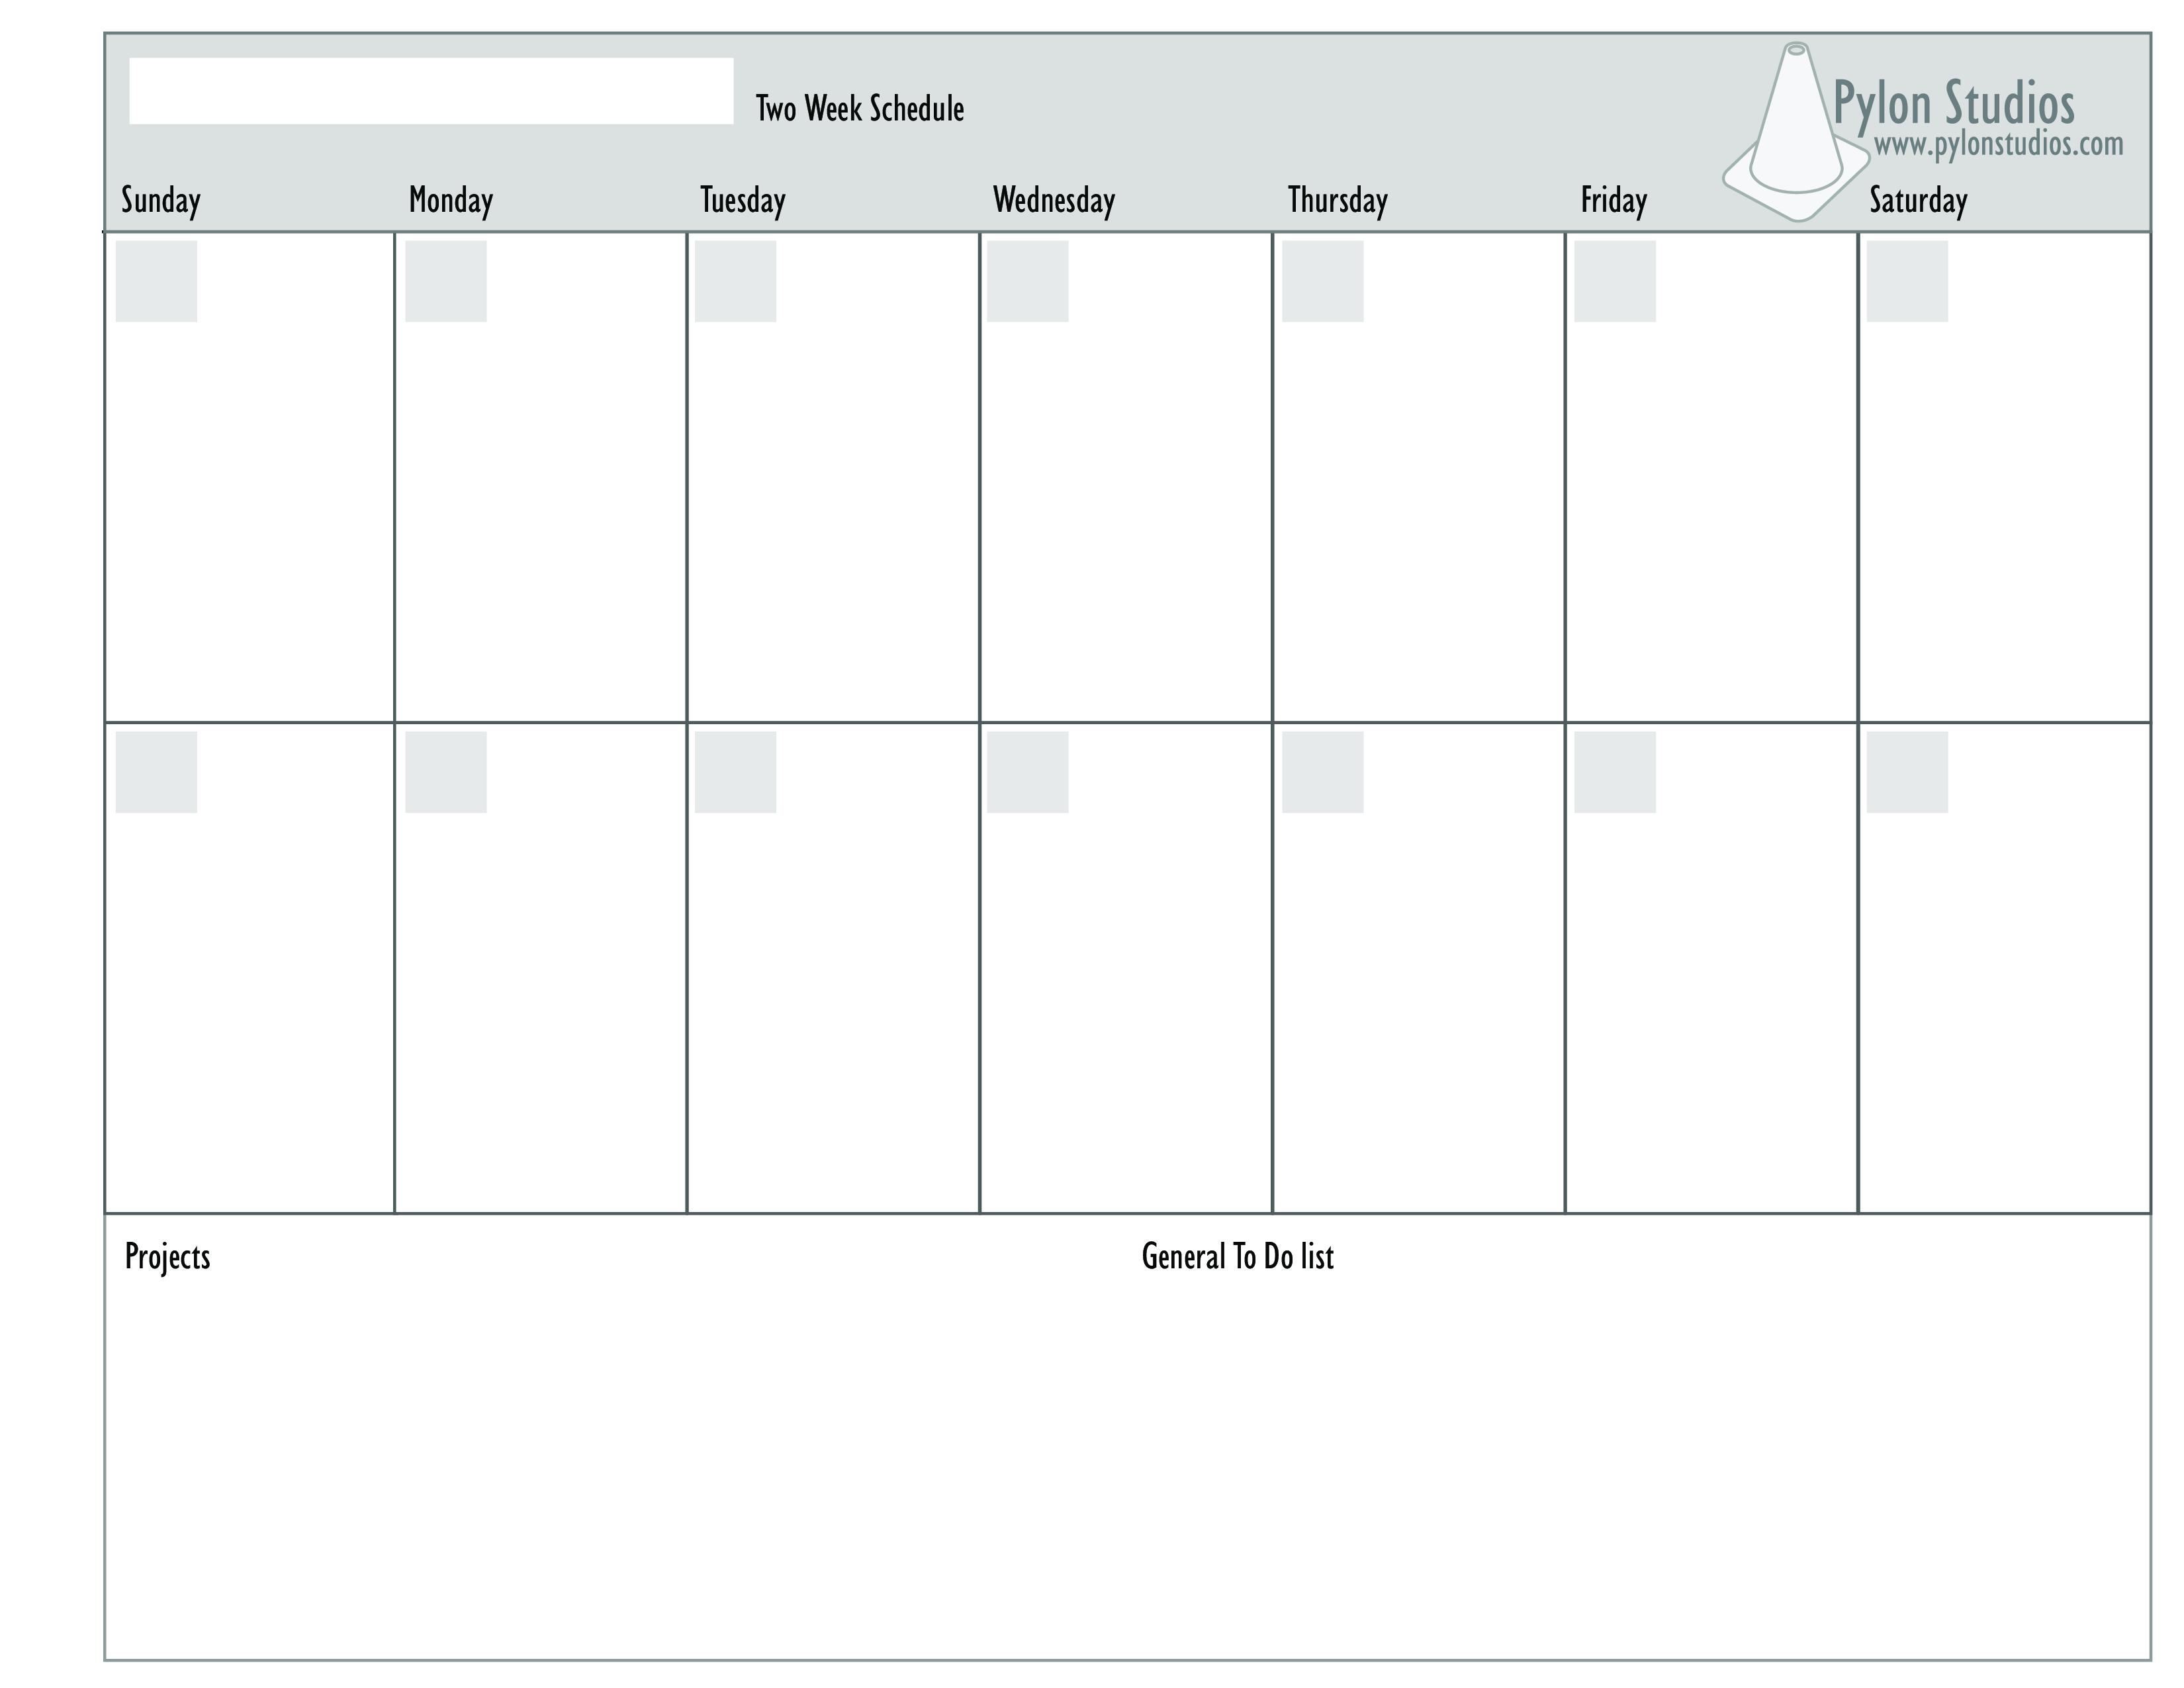 001 20Week Calendar Template Free Templates At Allbusinesstemplates throughout 2 Week Blank Calendar Template